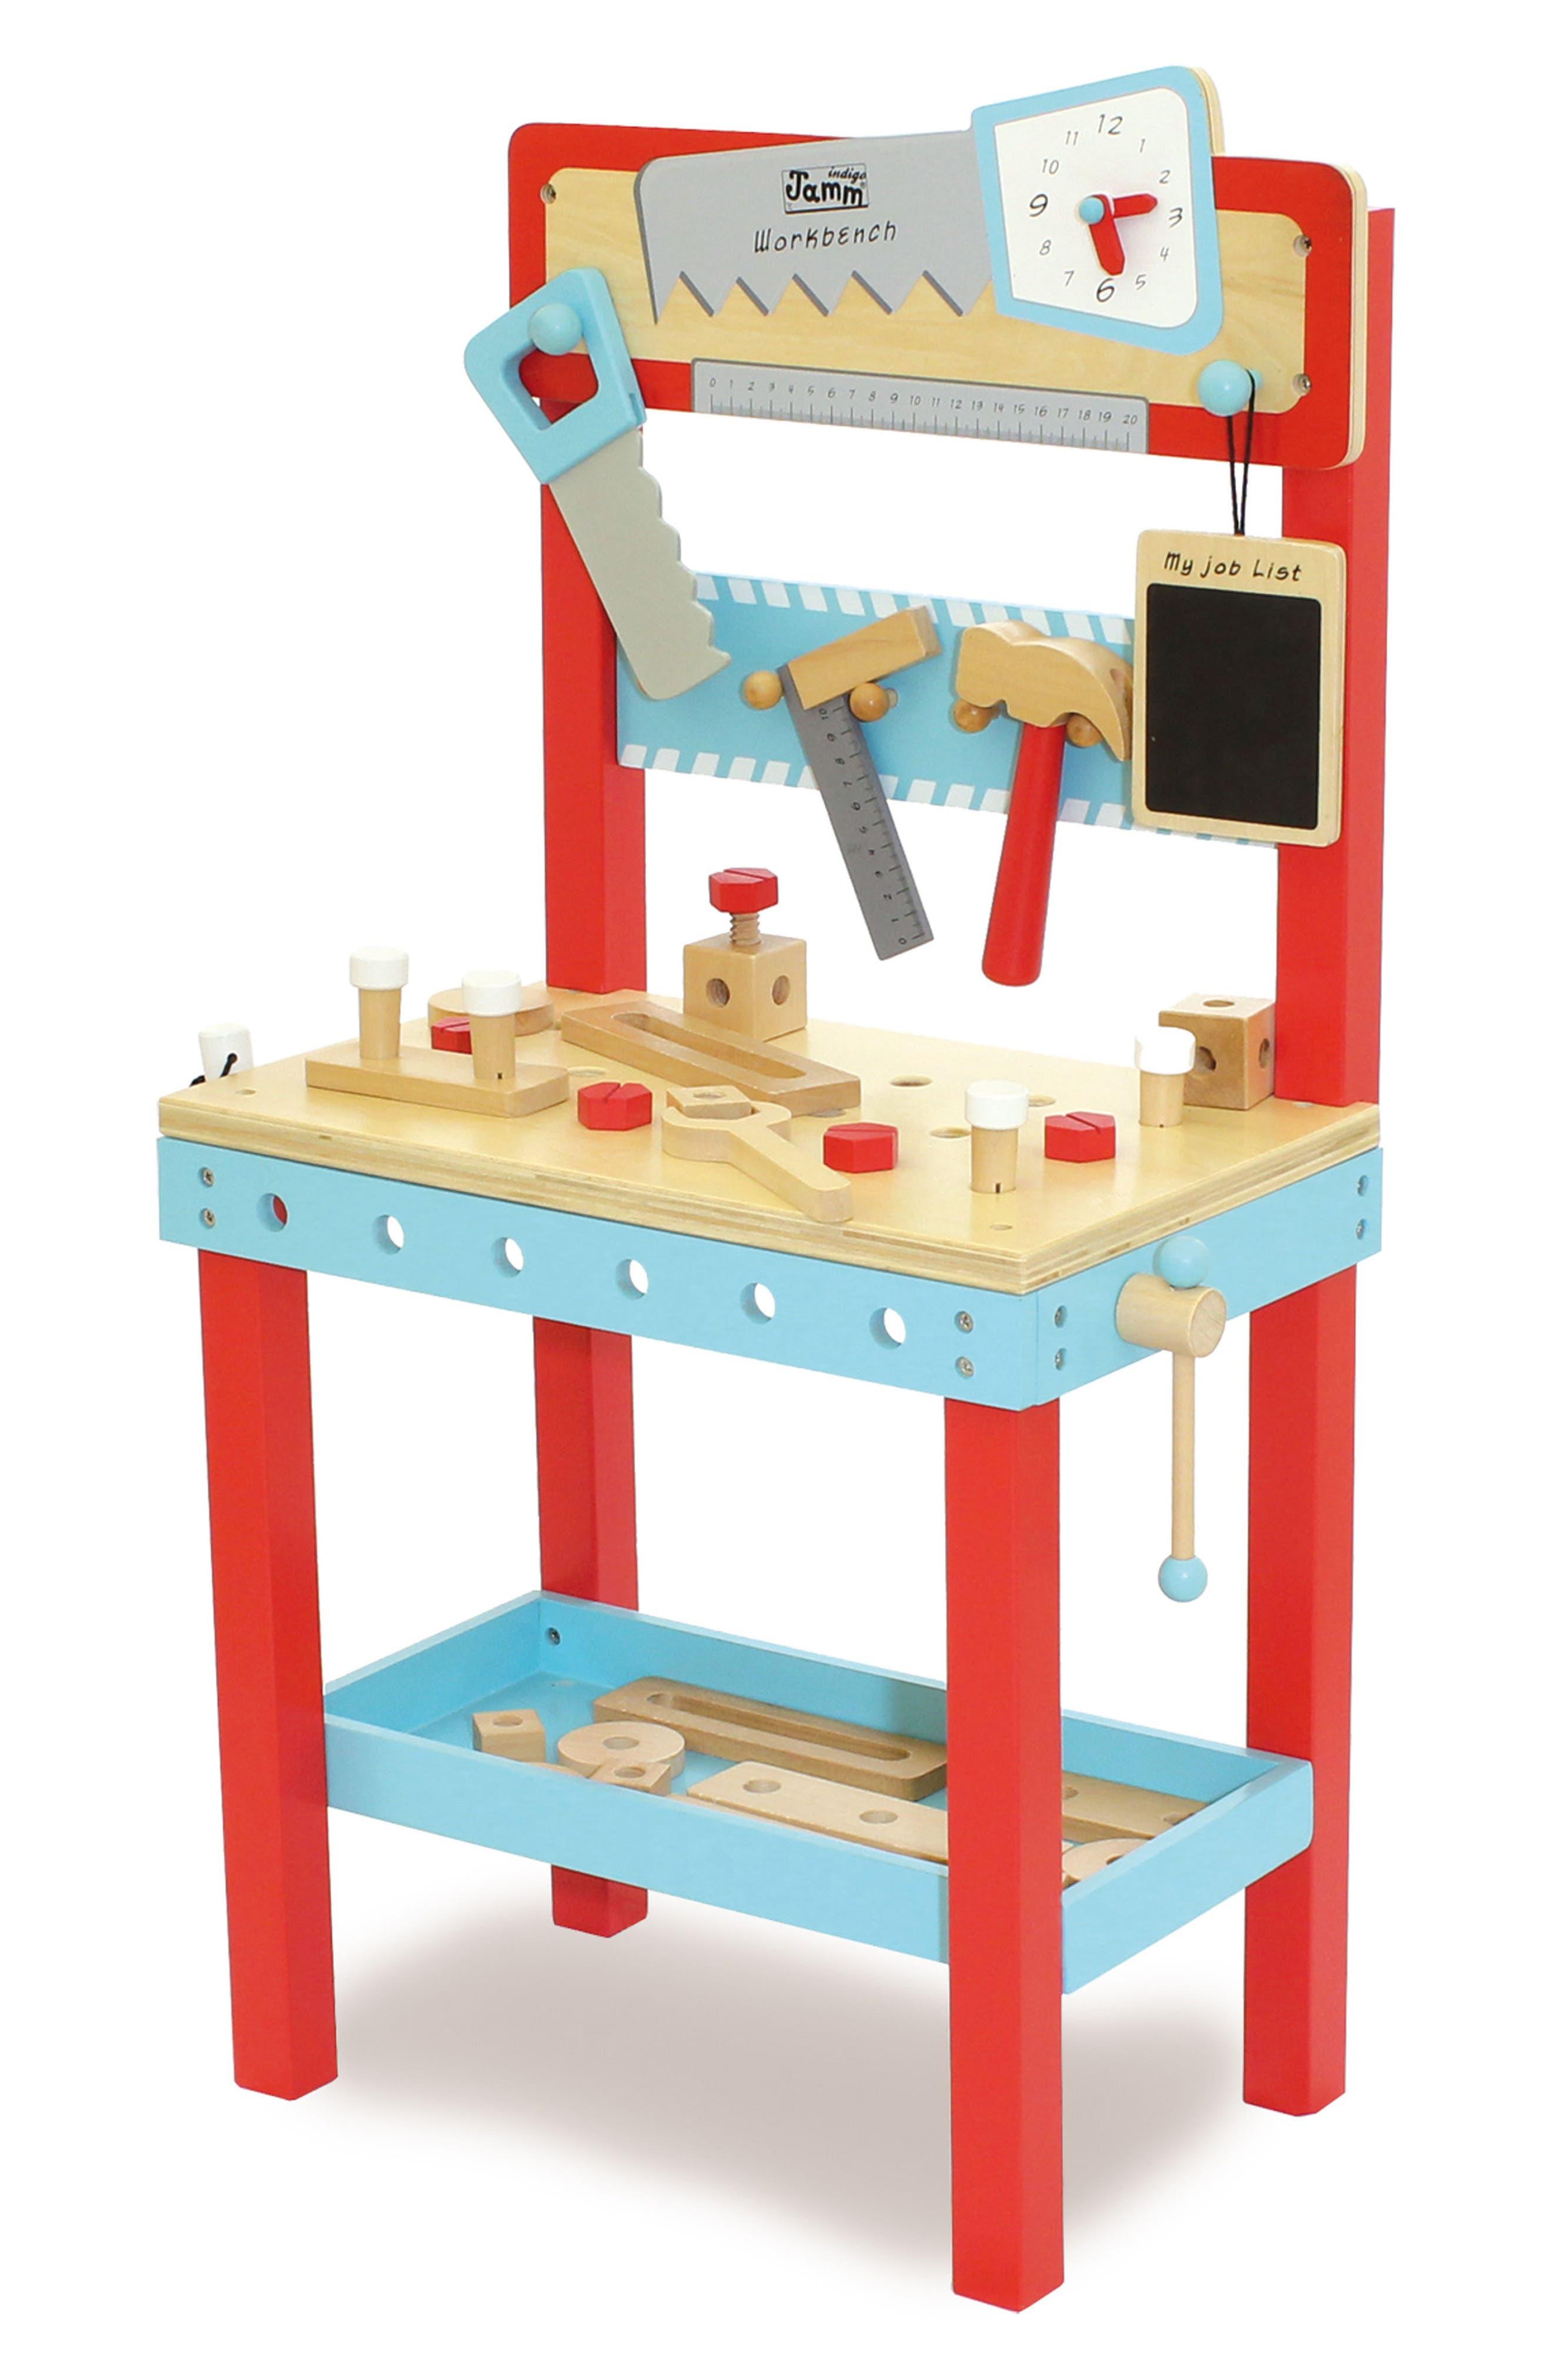 Alternate Image 1 Selected - Indigo Jamm Little Carpenters Workbench